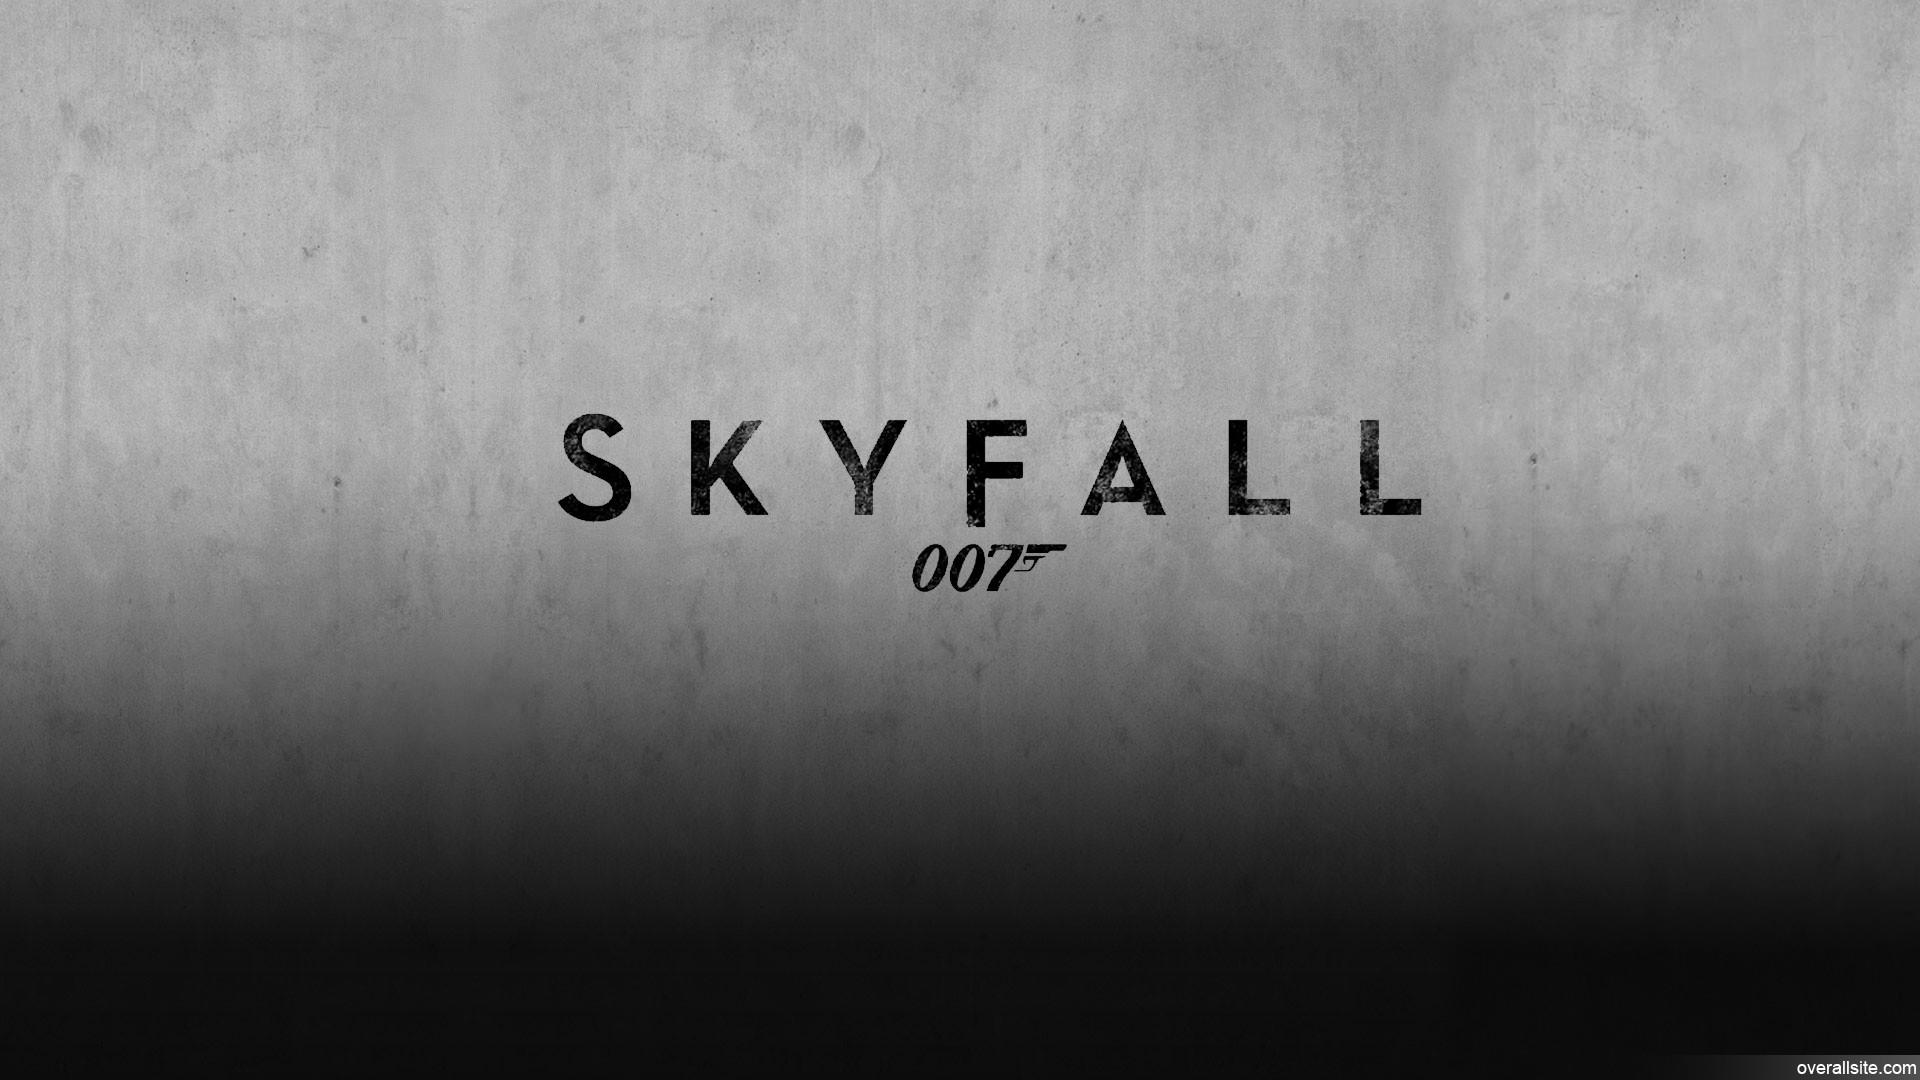 James Bond 007 Wallpaper (63+ Images